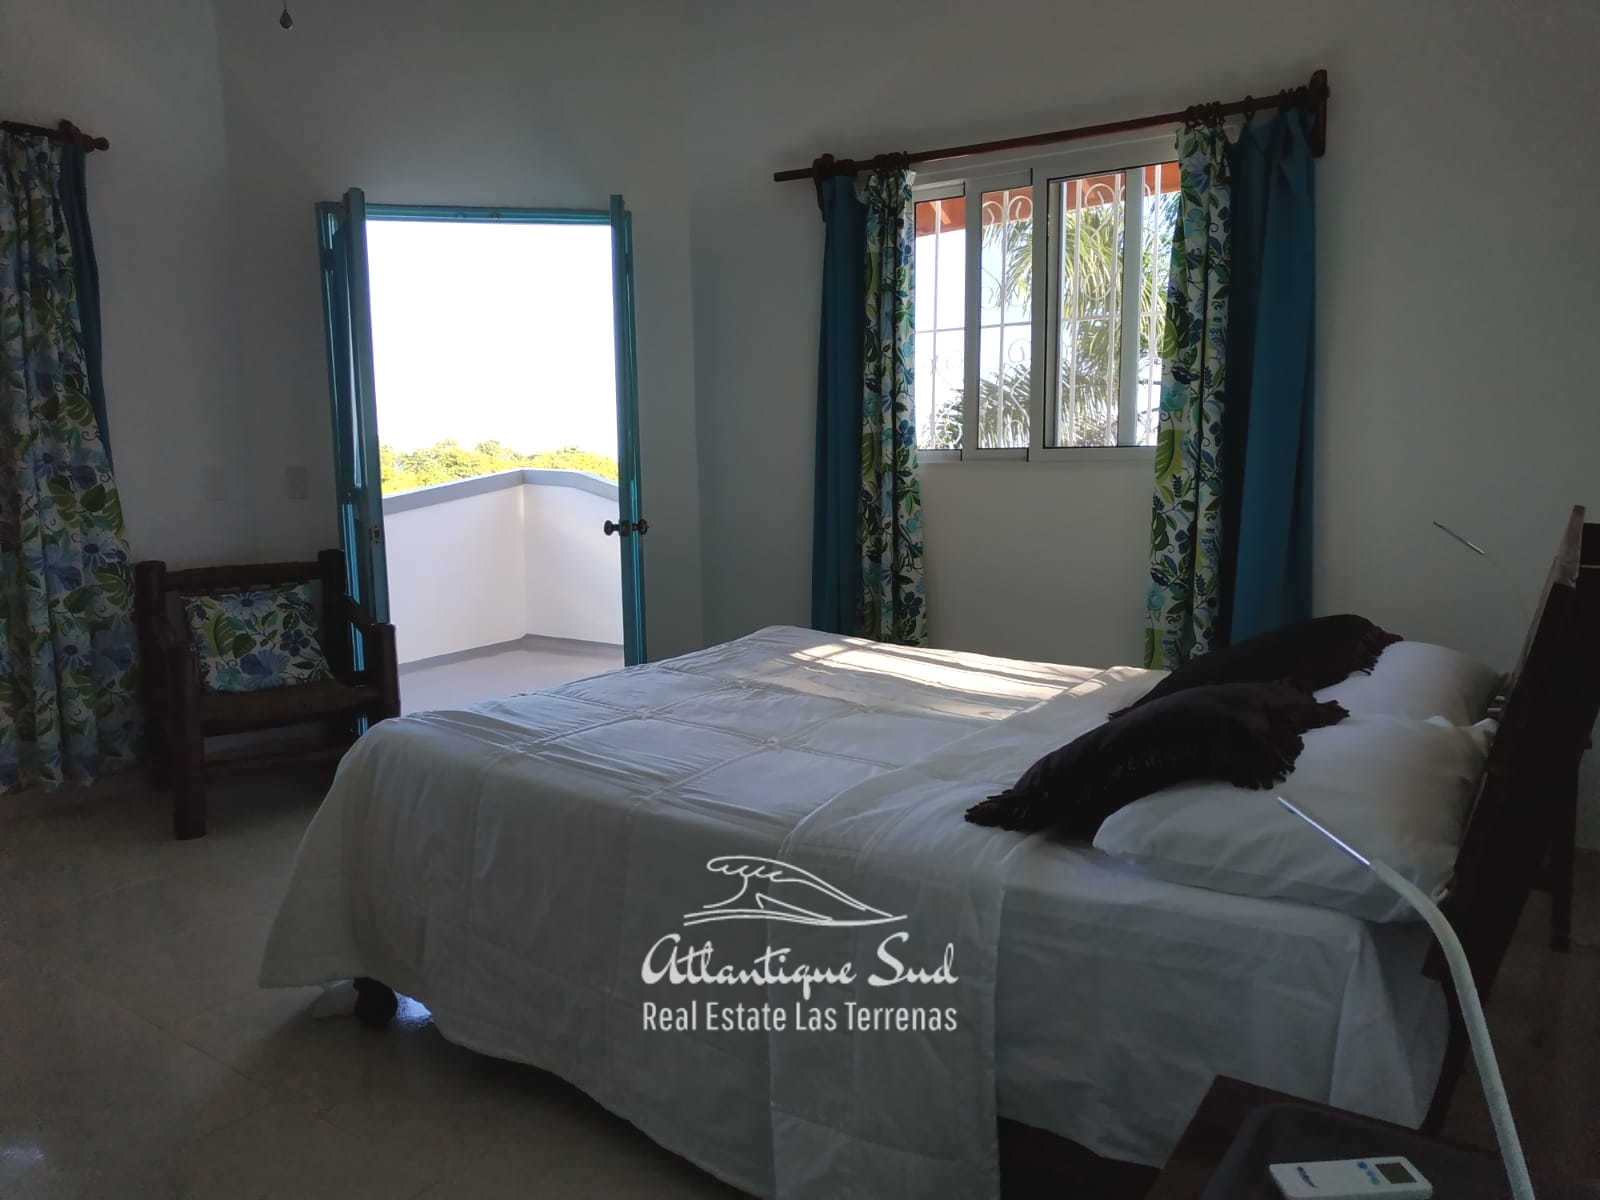 Villa for sale on hill in Las Terrenas Dominican republic11.jpg